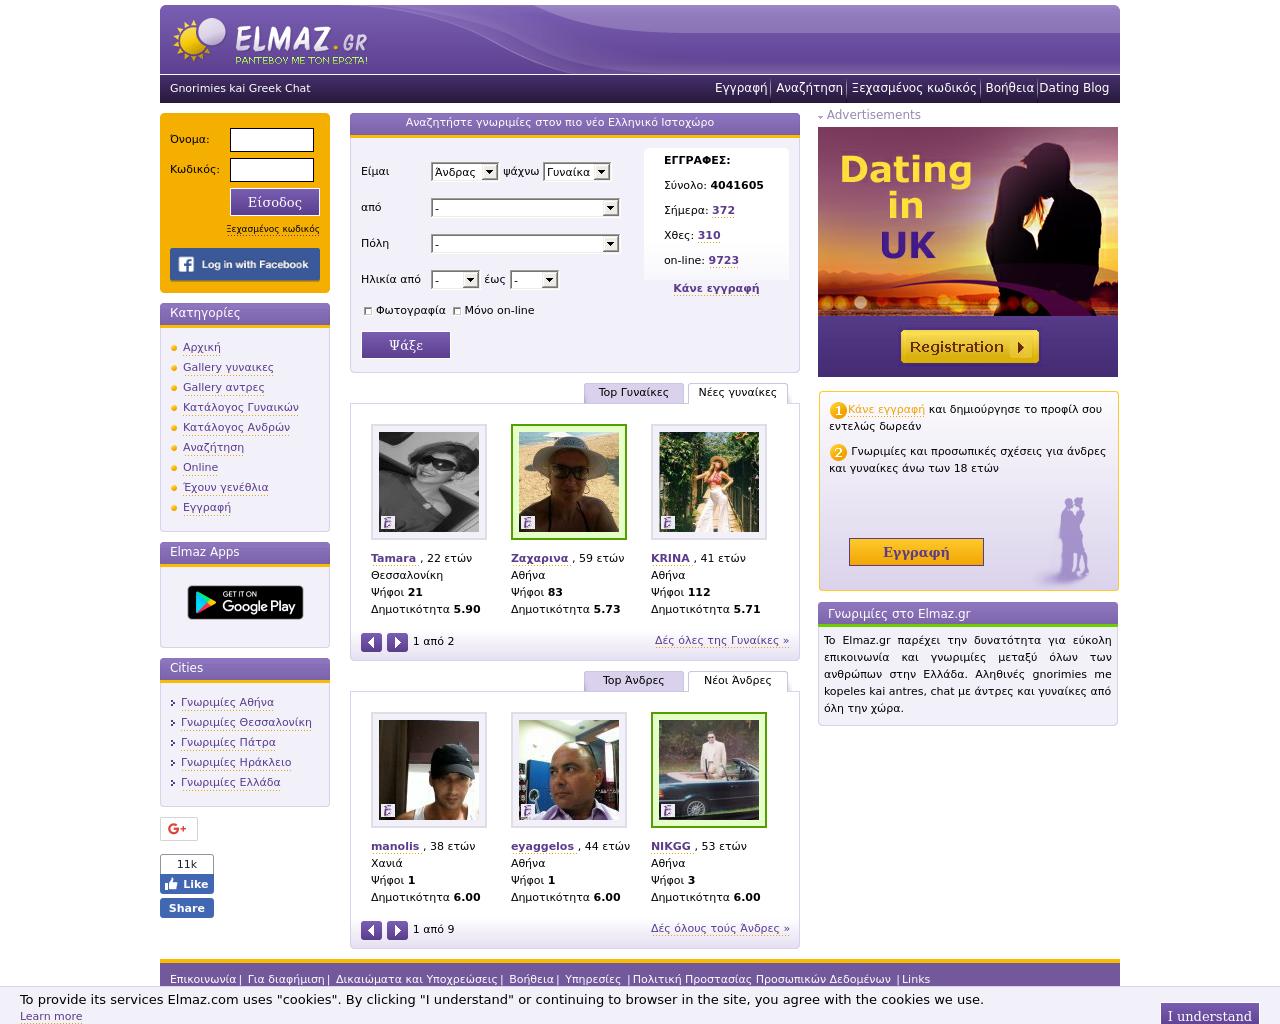 Elmaz.gr-Advertising-Reviews-Pricing